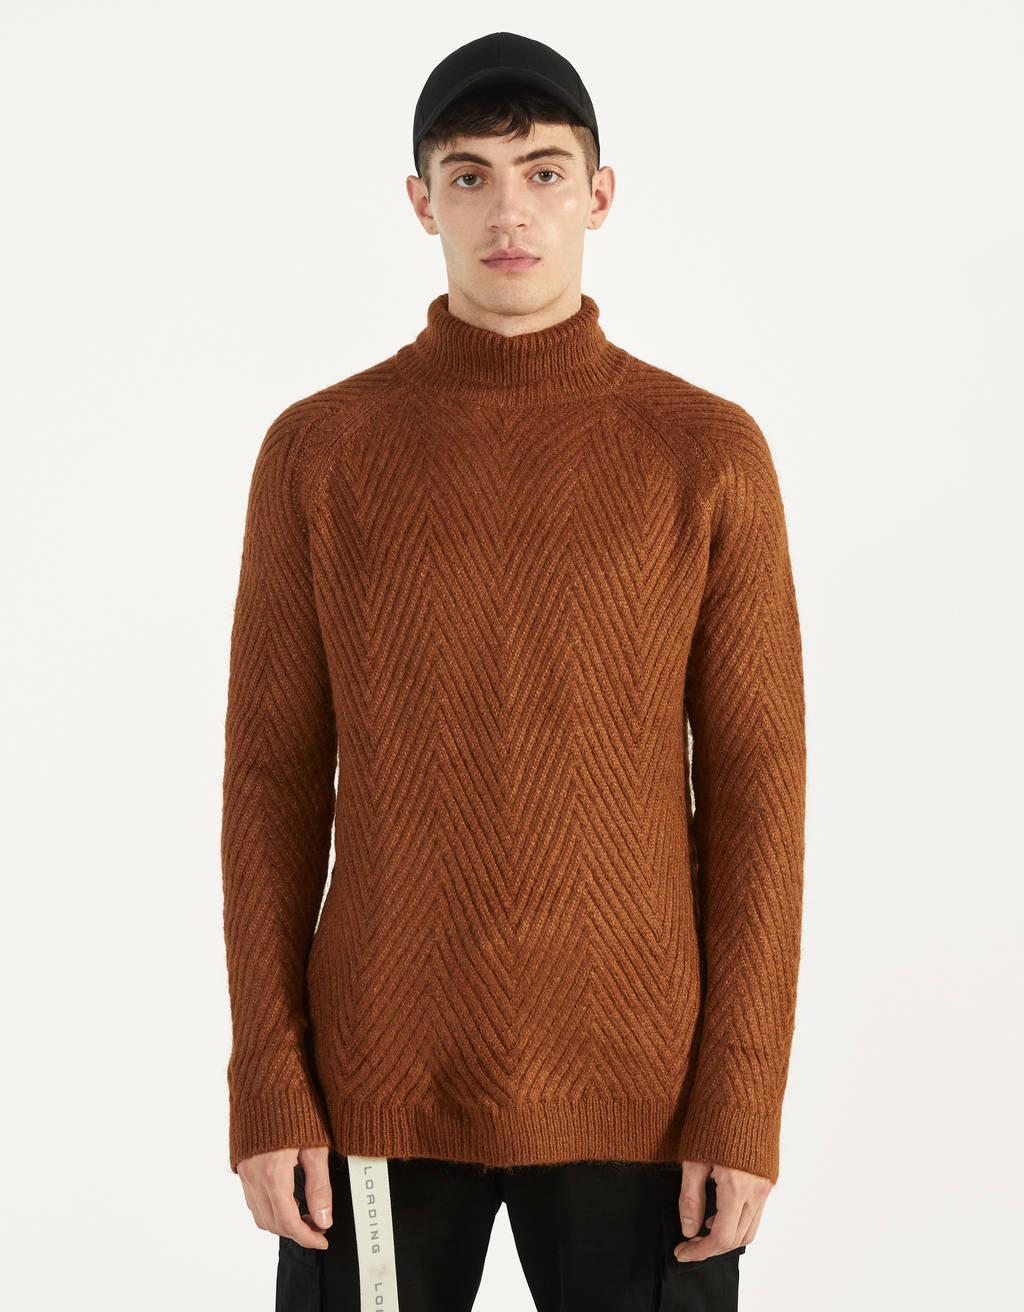 Sweater trançada de gola alta